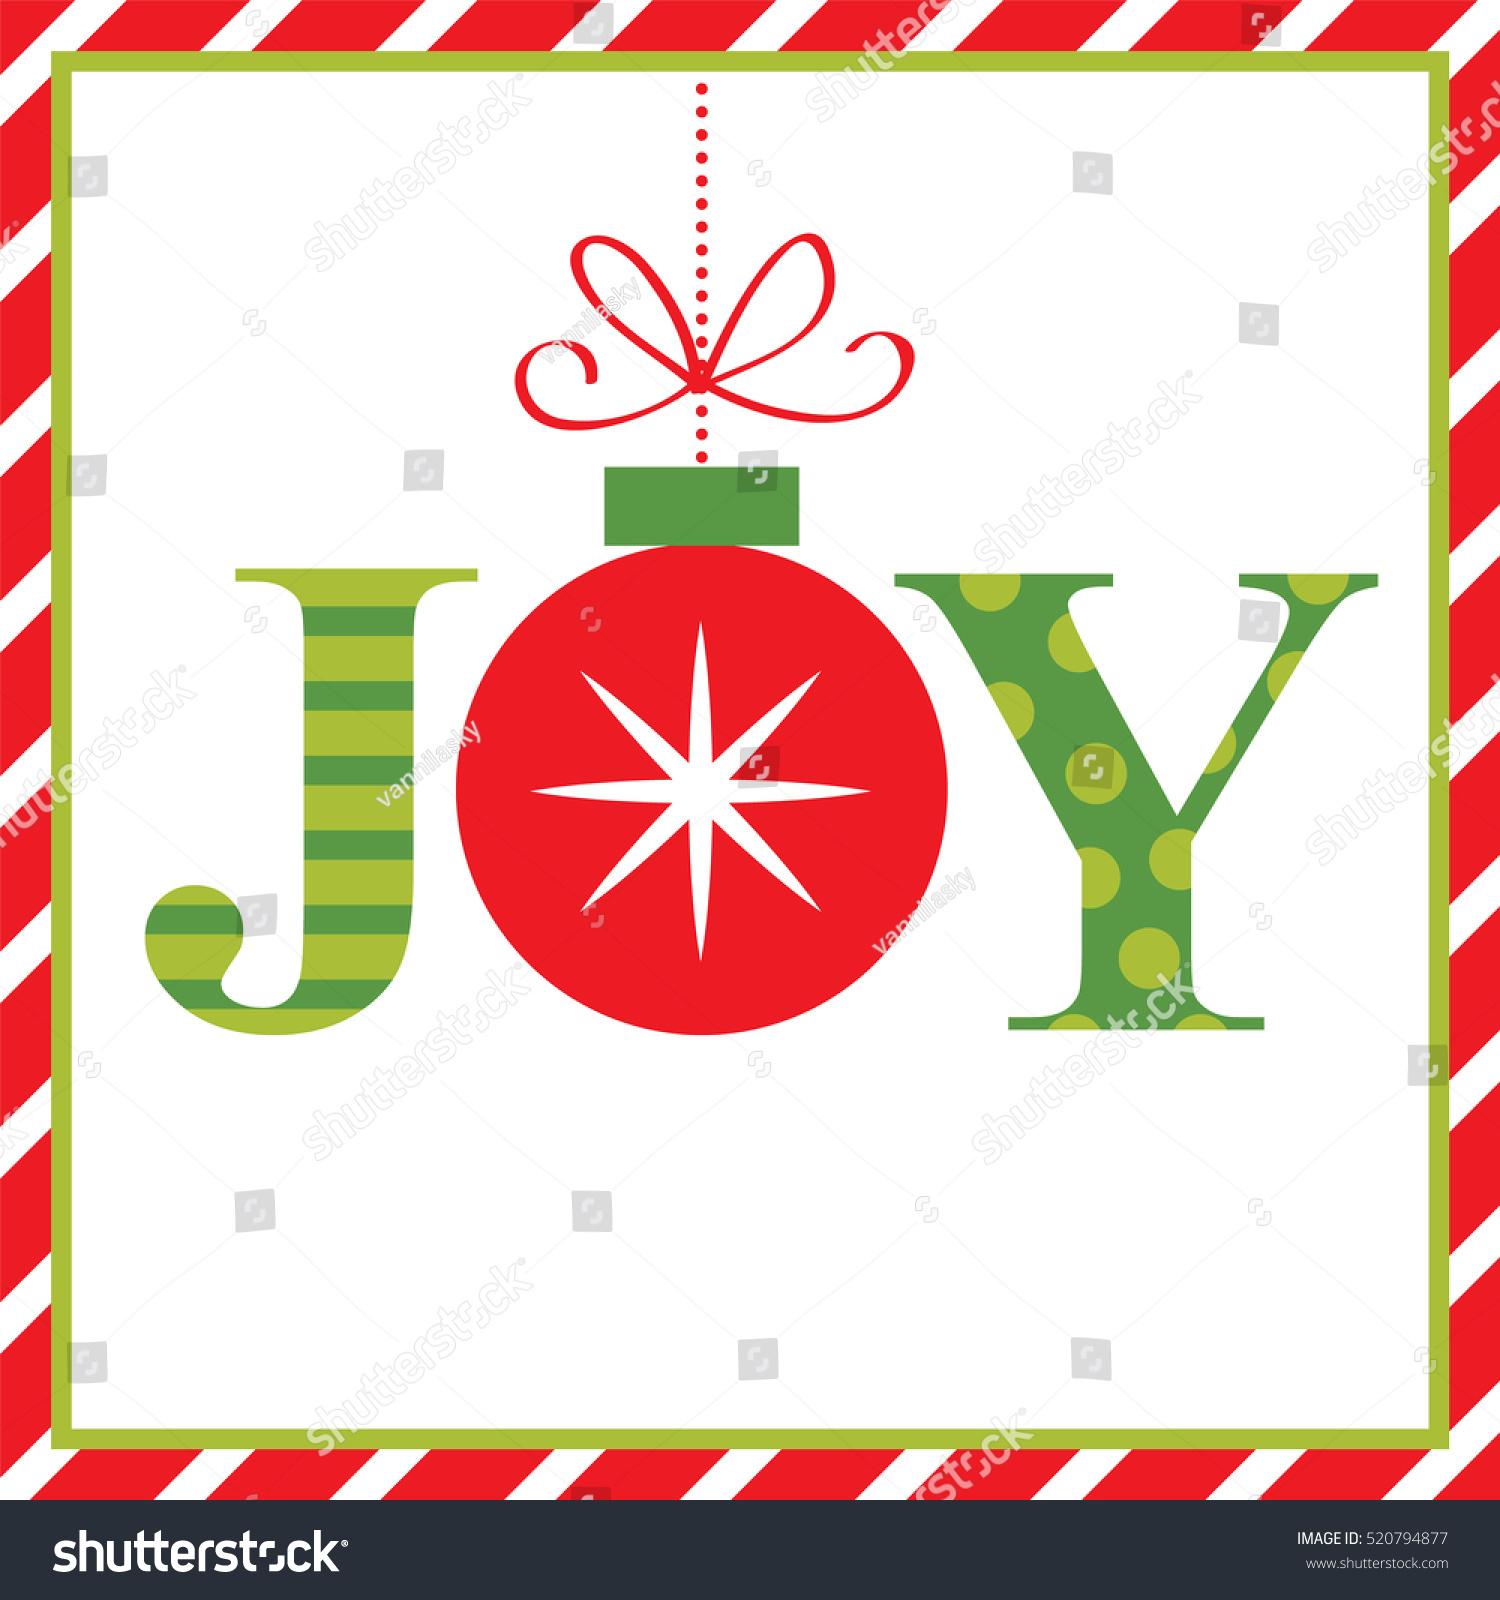 Joy Christmas Card Stock Vector (Royalty Free) 520794877 - Shutterstock